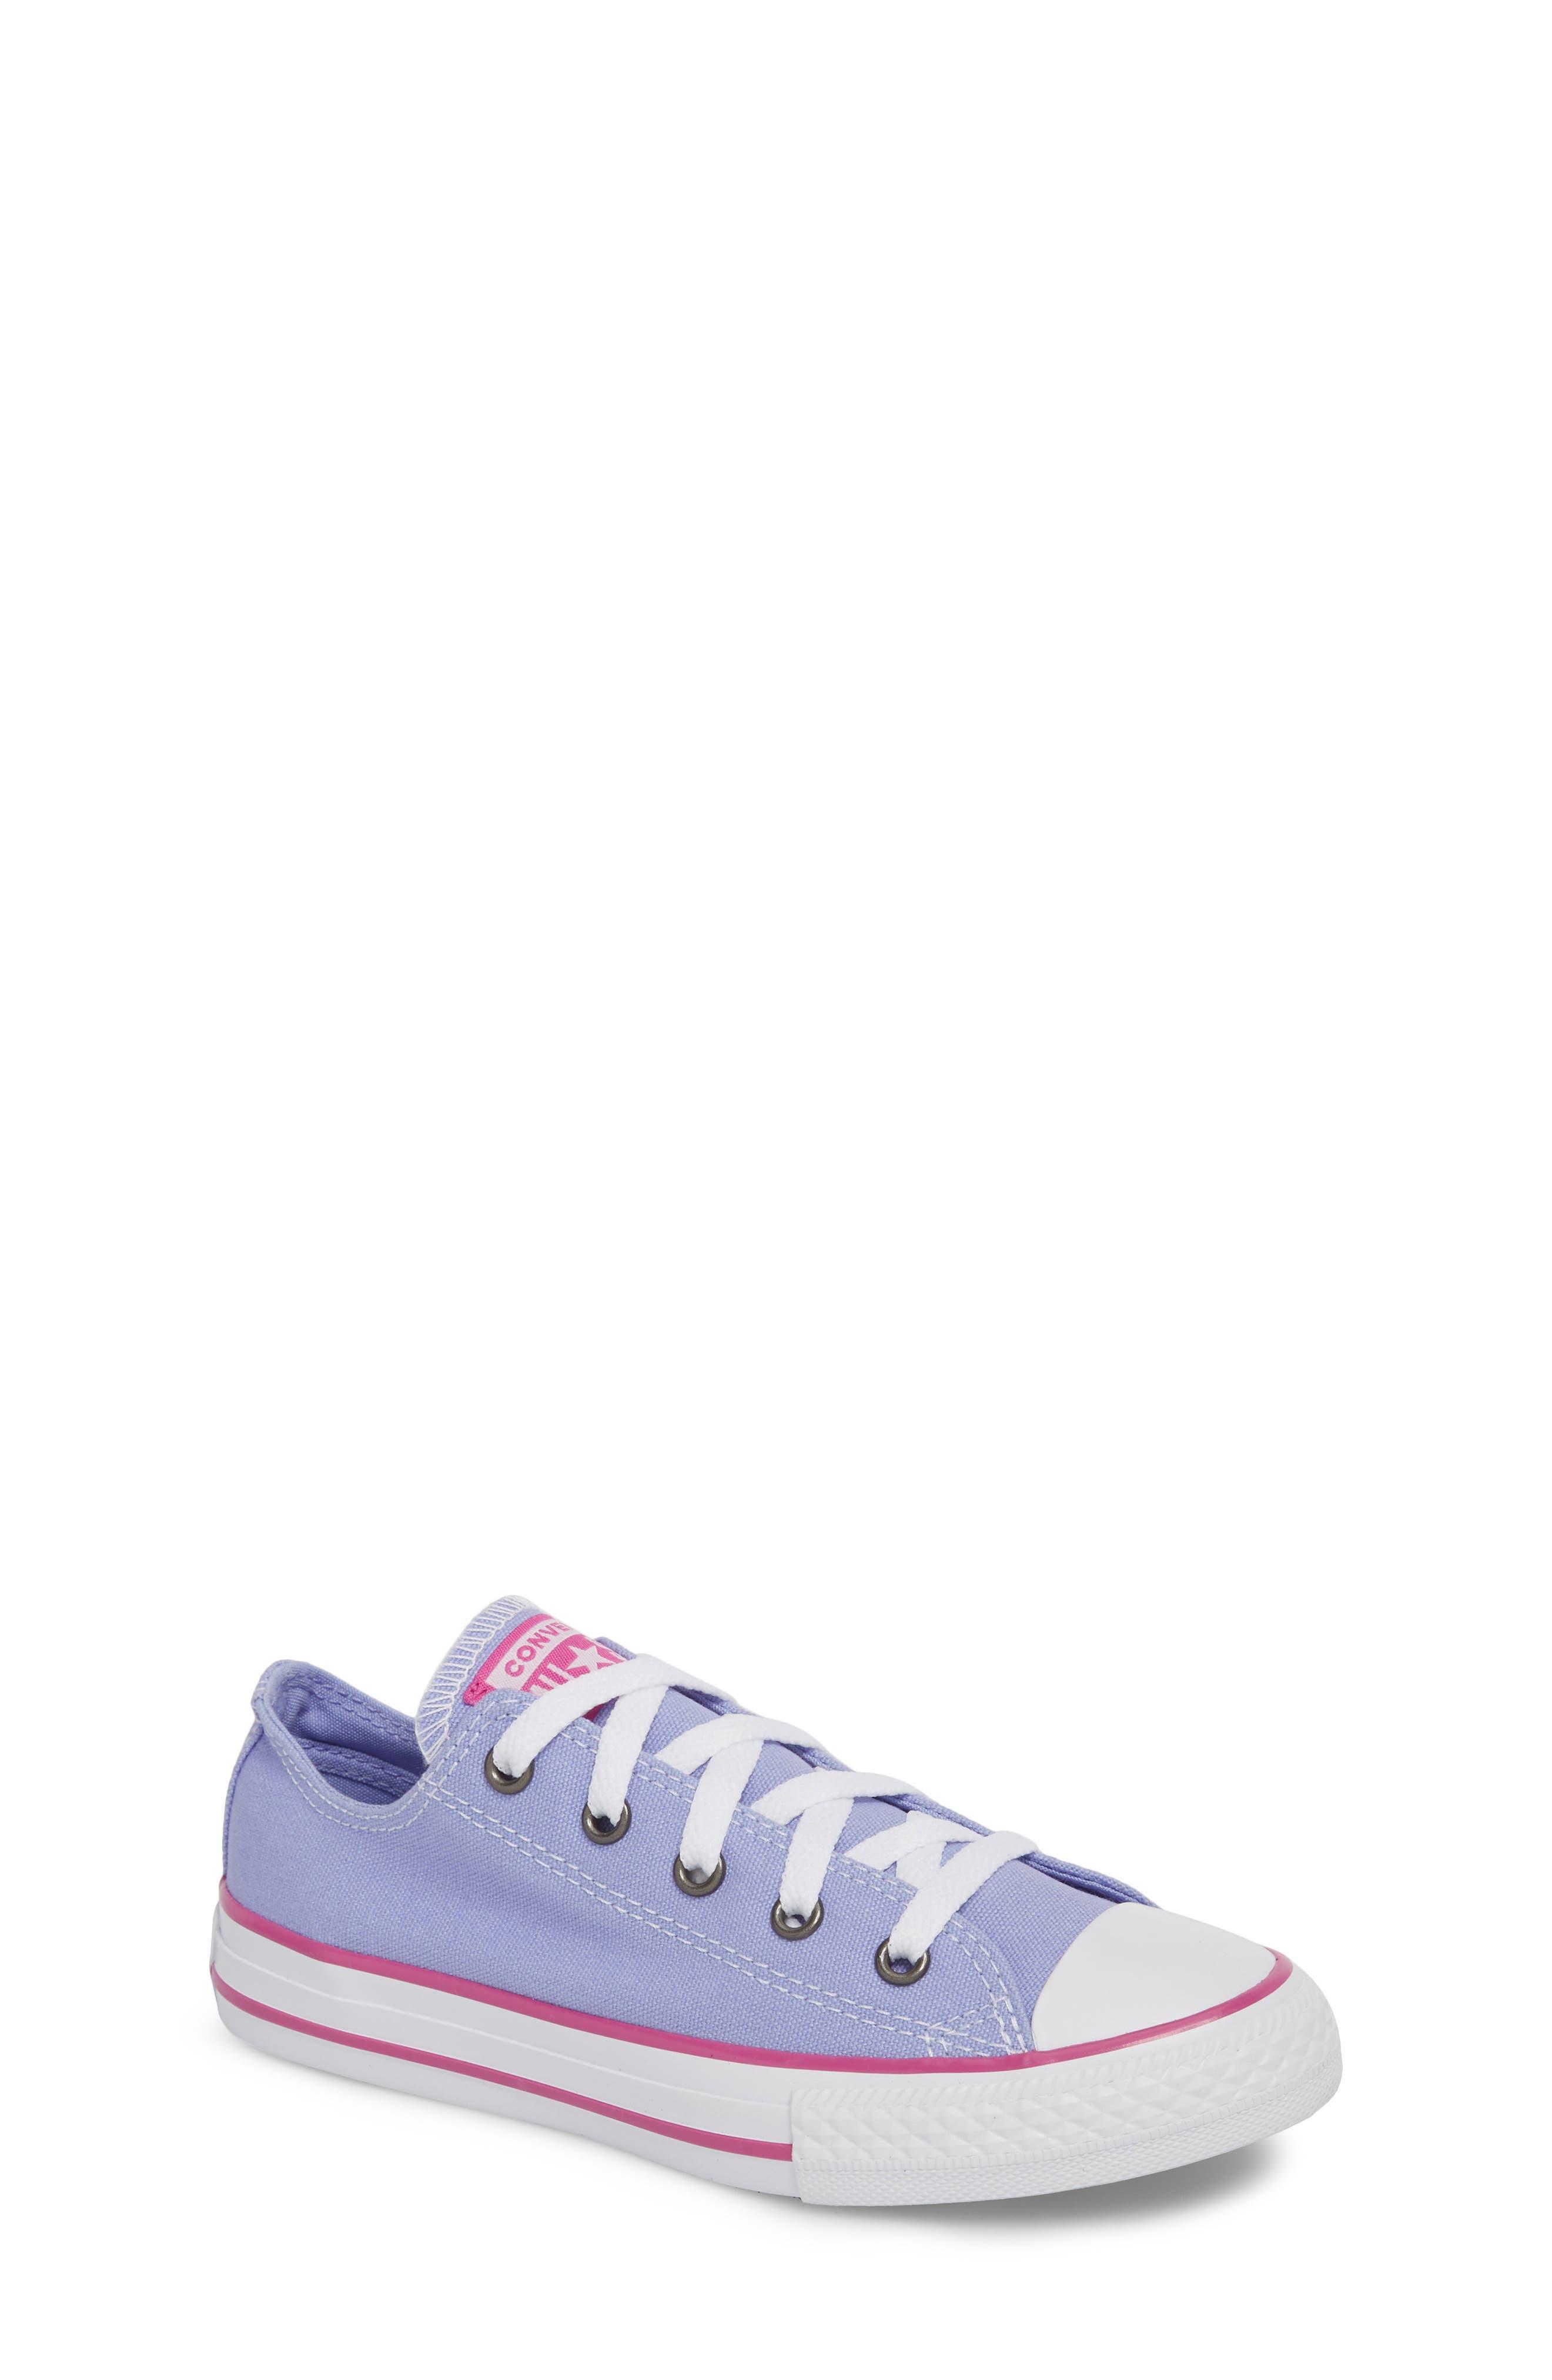 Converse All Star® Low Top Sneaker (Toddler, Little Kid & Big Kid)